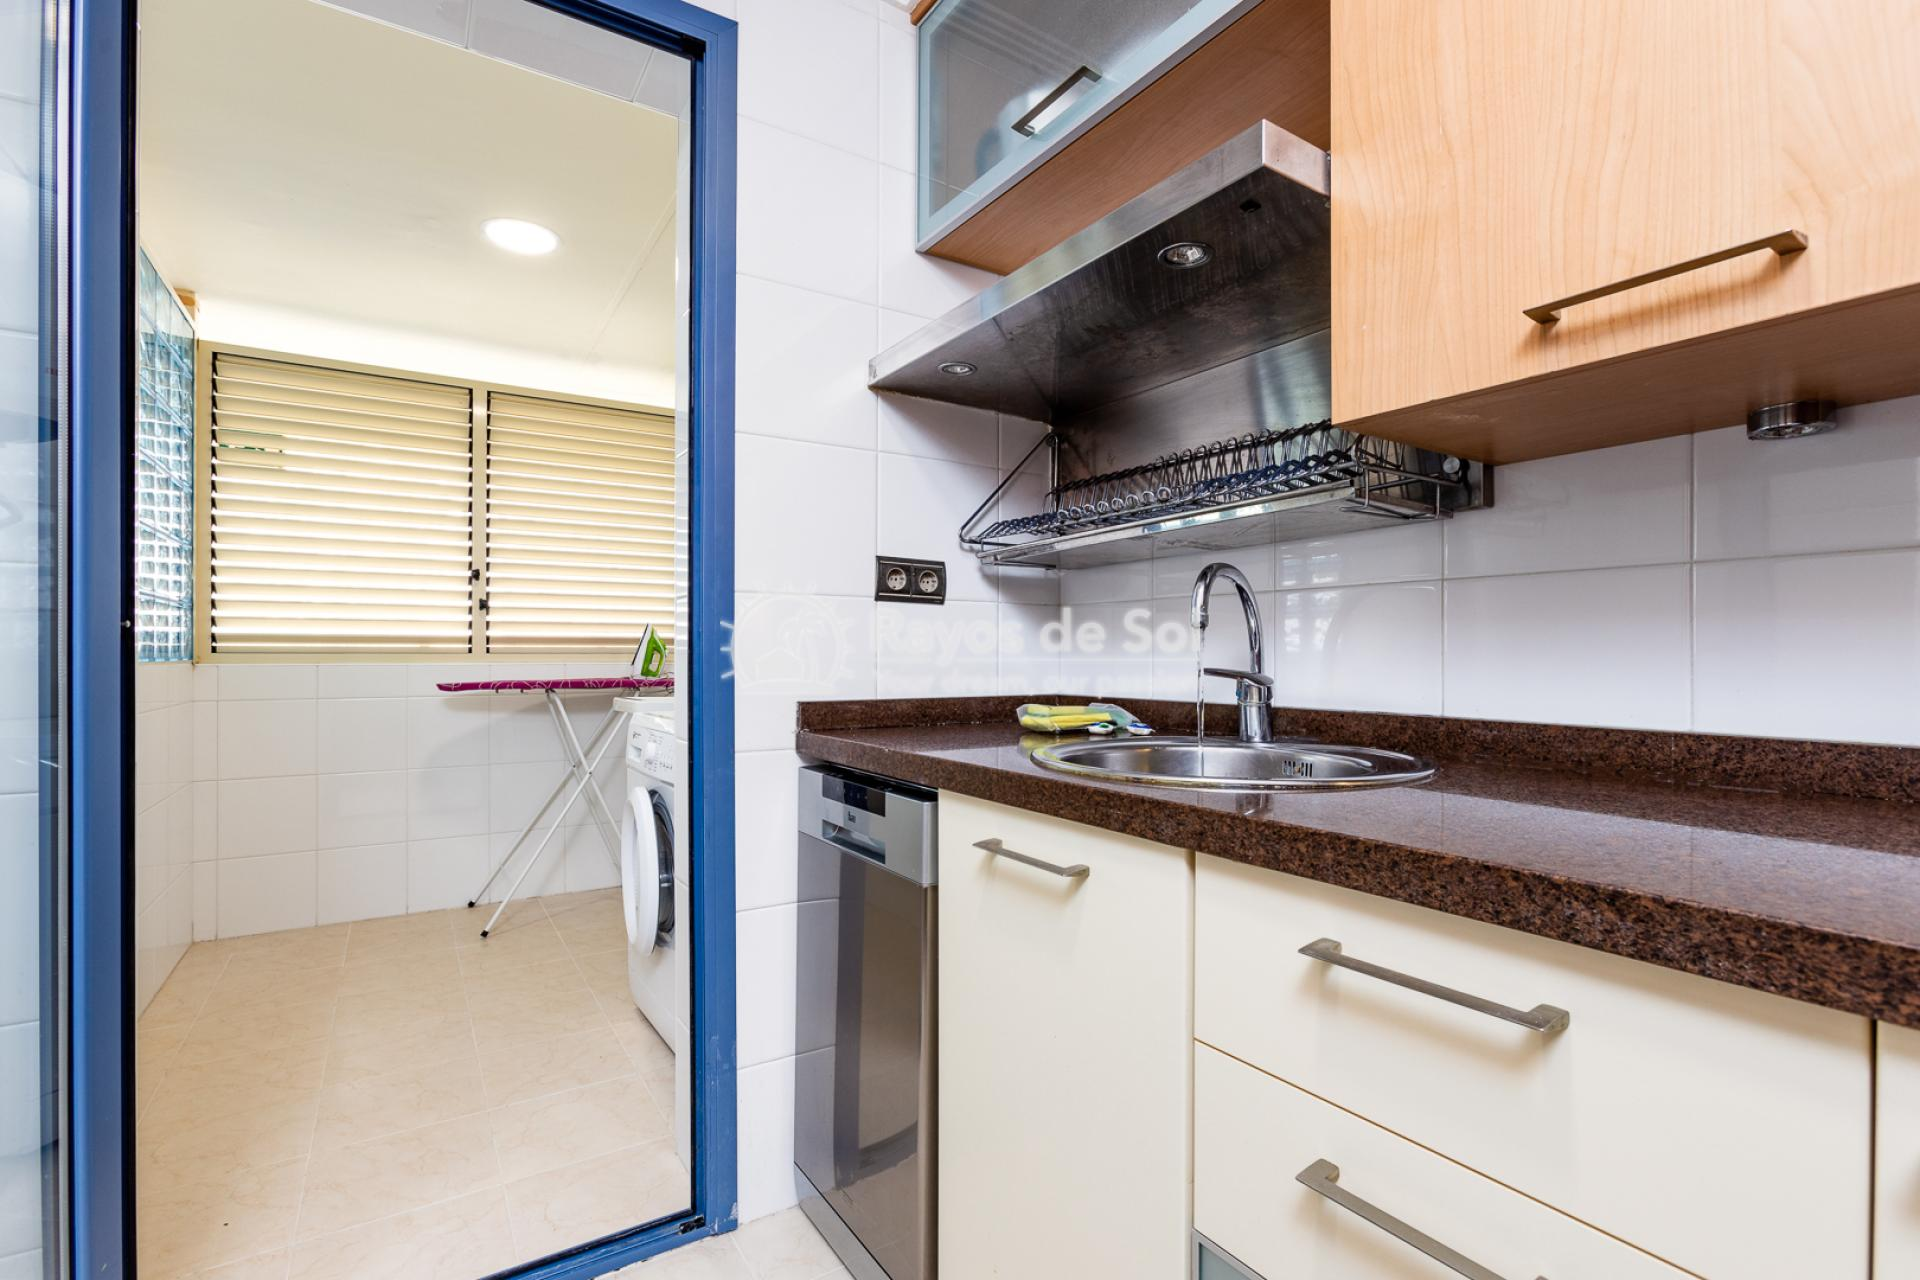 Turnekey first line apartments  in Altea, Costa Blanca (Alteabeach) - 26